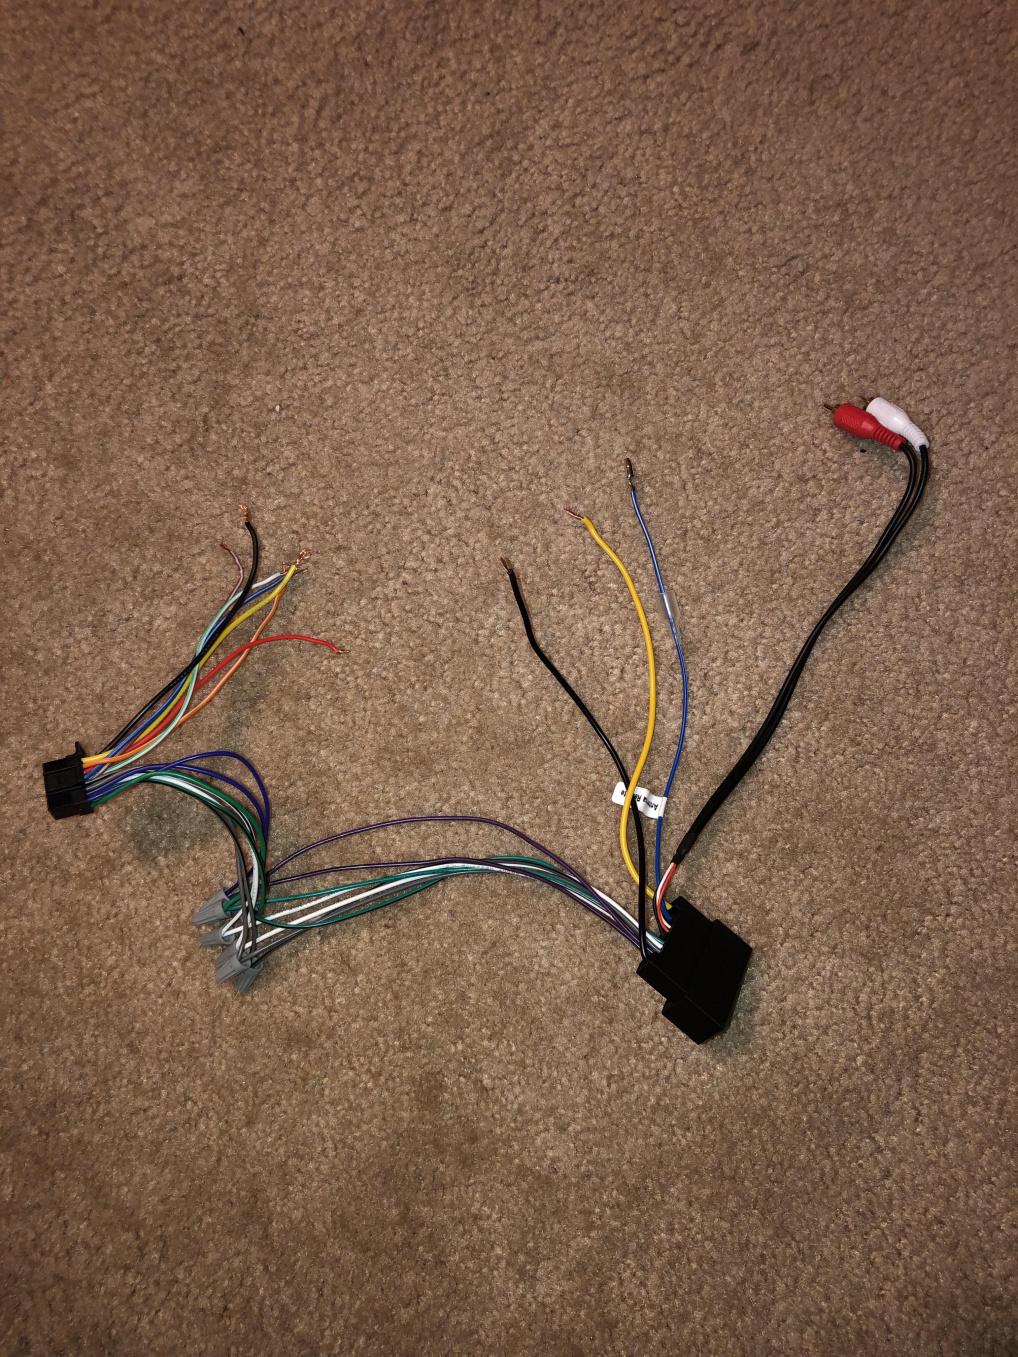 2012 focus se headunit wiring help-unnamed.jpg